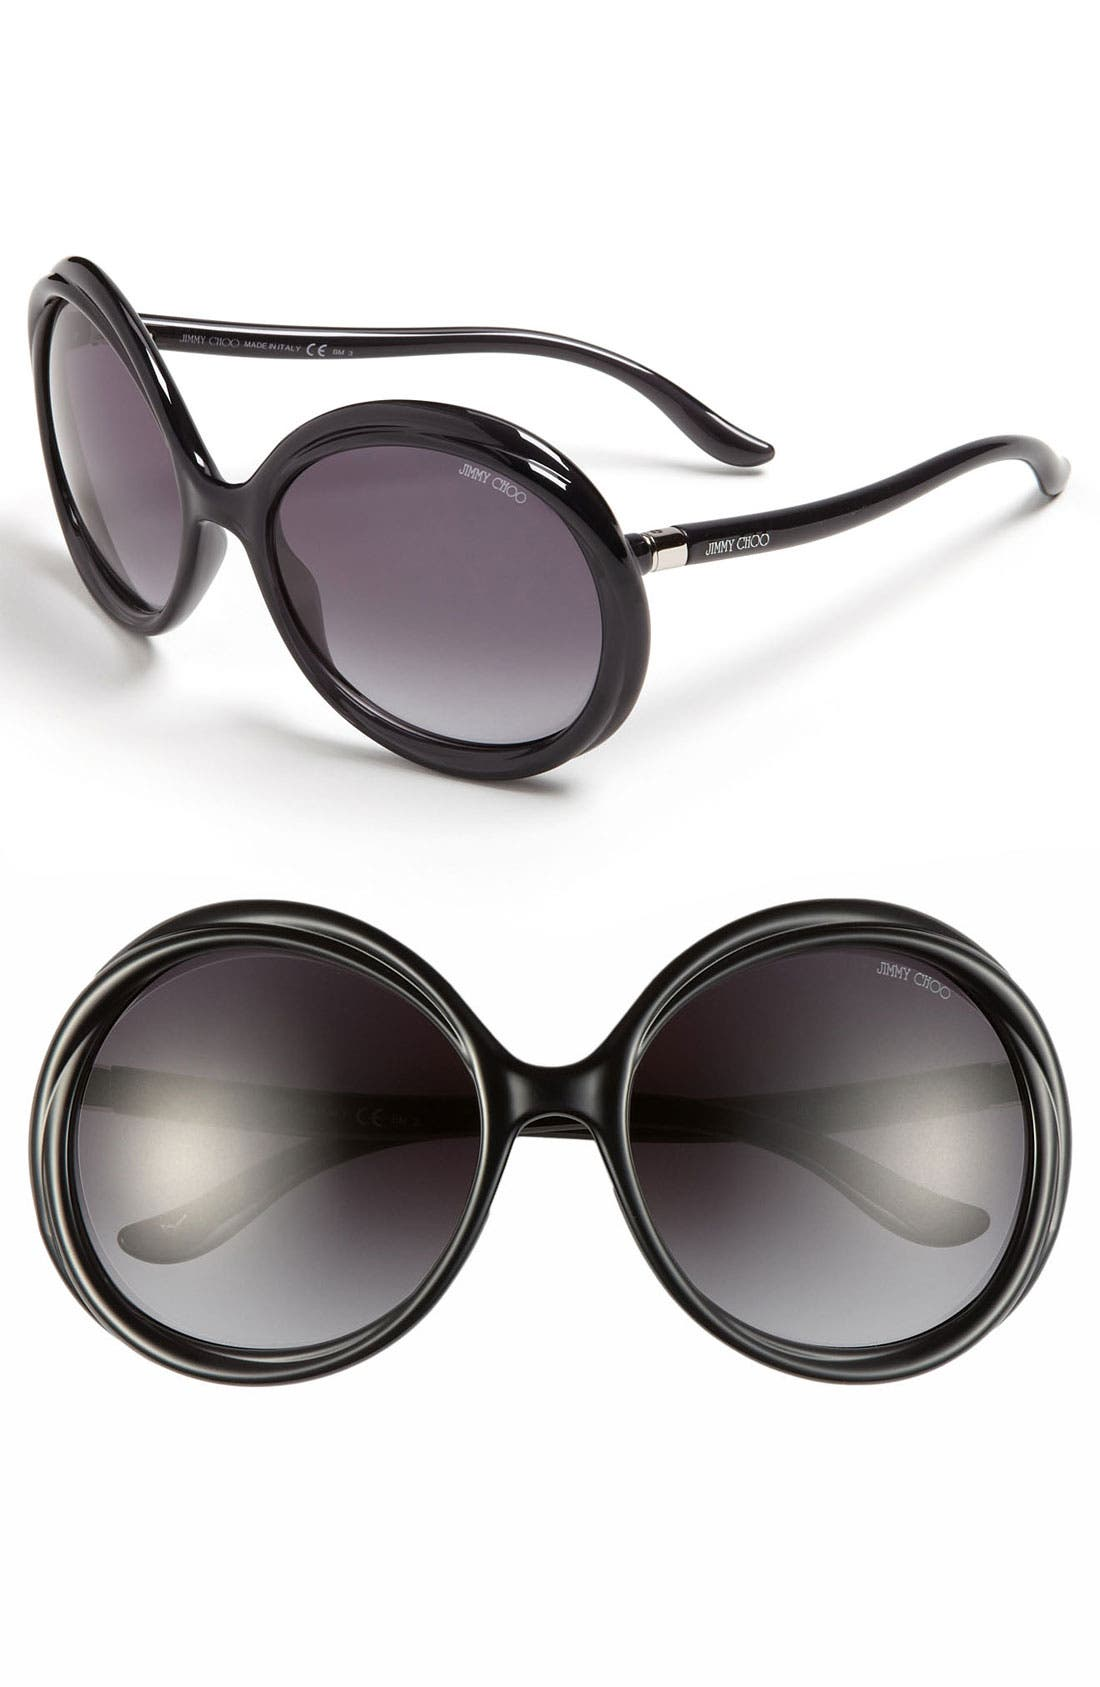 Alternate Image 1 Selected - Jimmy Choo 'Mindy' 59mm Sunglasses